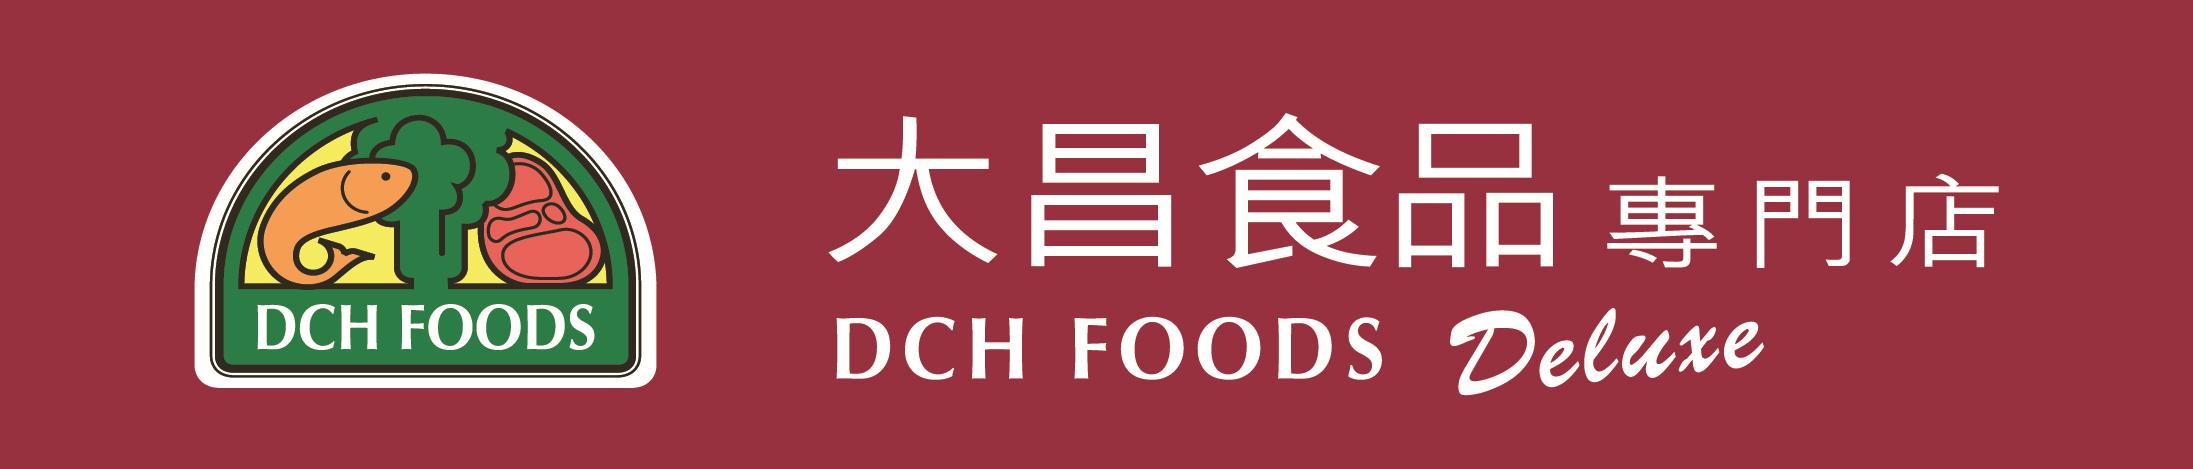 food scheme 2017 gold DCH FoodMart